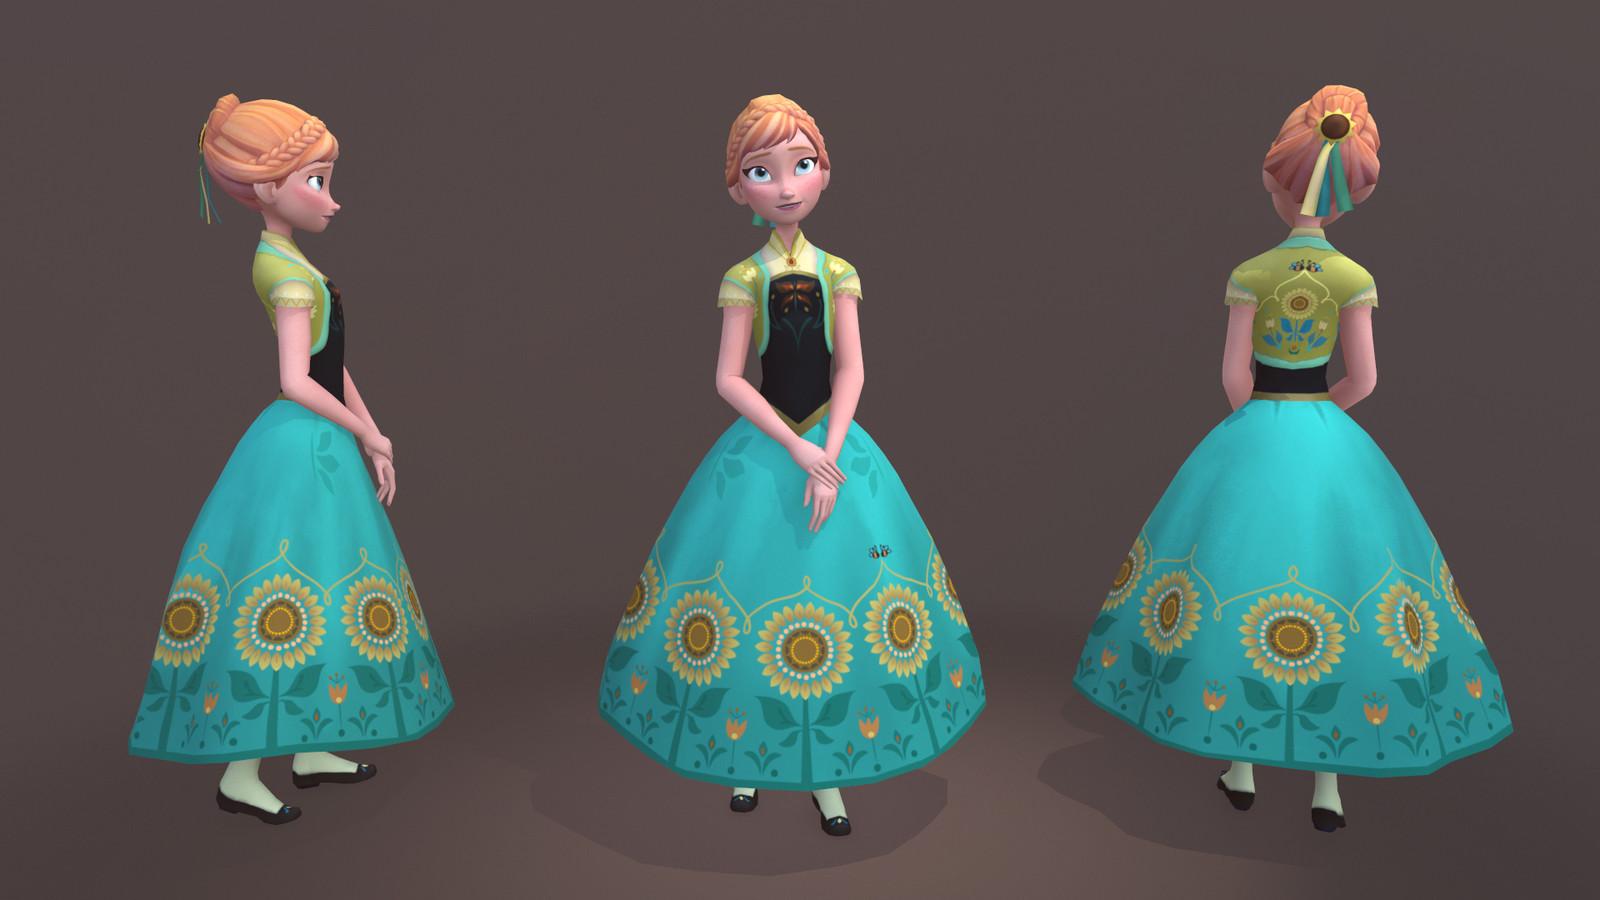 Disney Frozen: Anna Low Poly Model